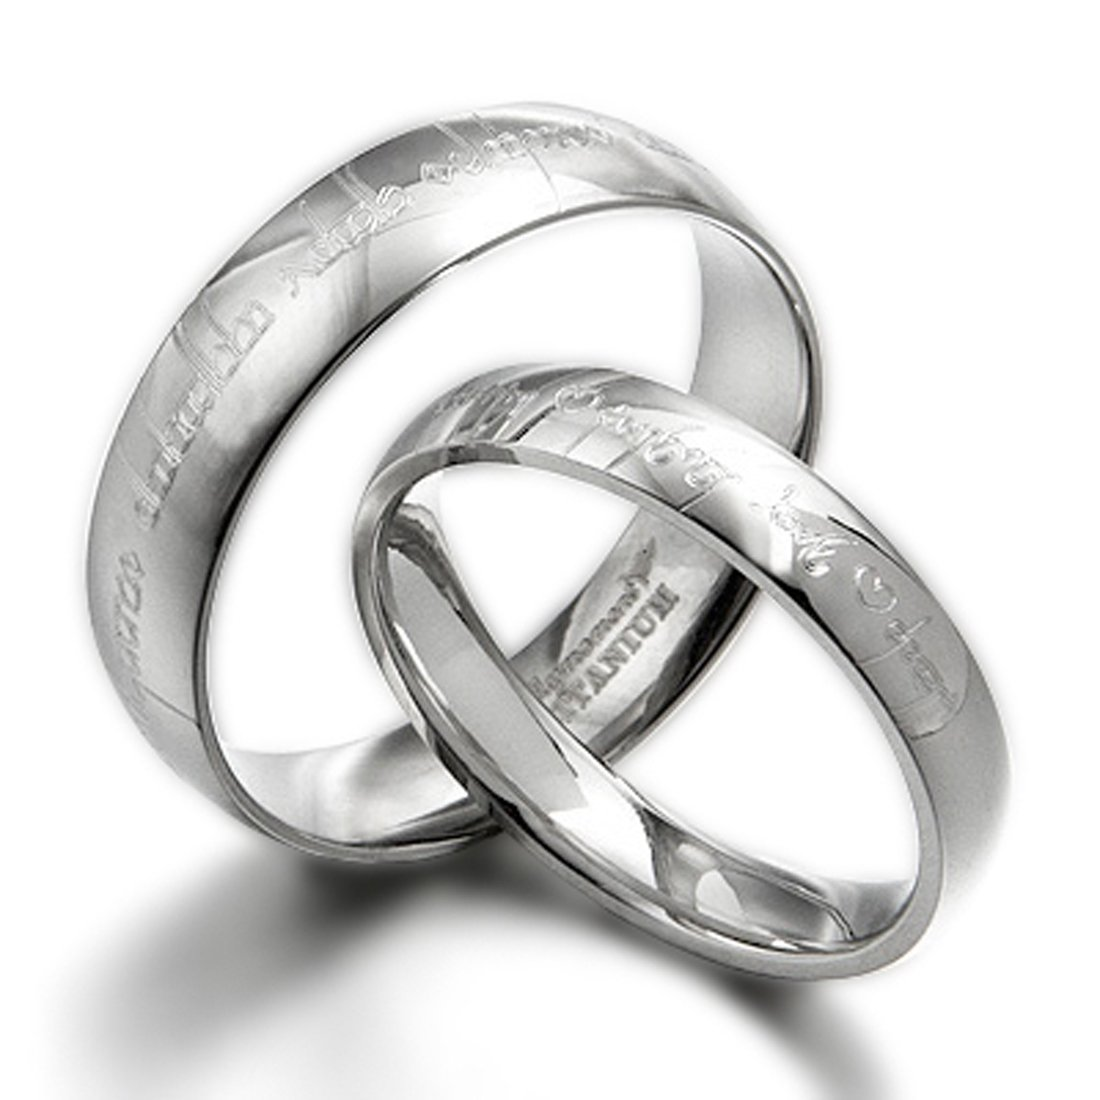 GeminiHis & Her Couple Personalized Elvish Tengwar Matching Wedding Titanium Rings Set, Dome Court, UK Size H to Z7